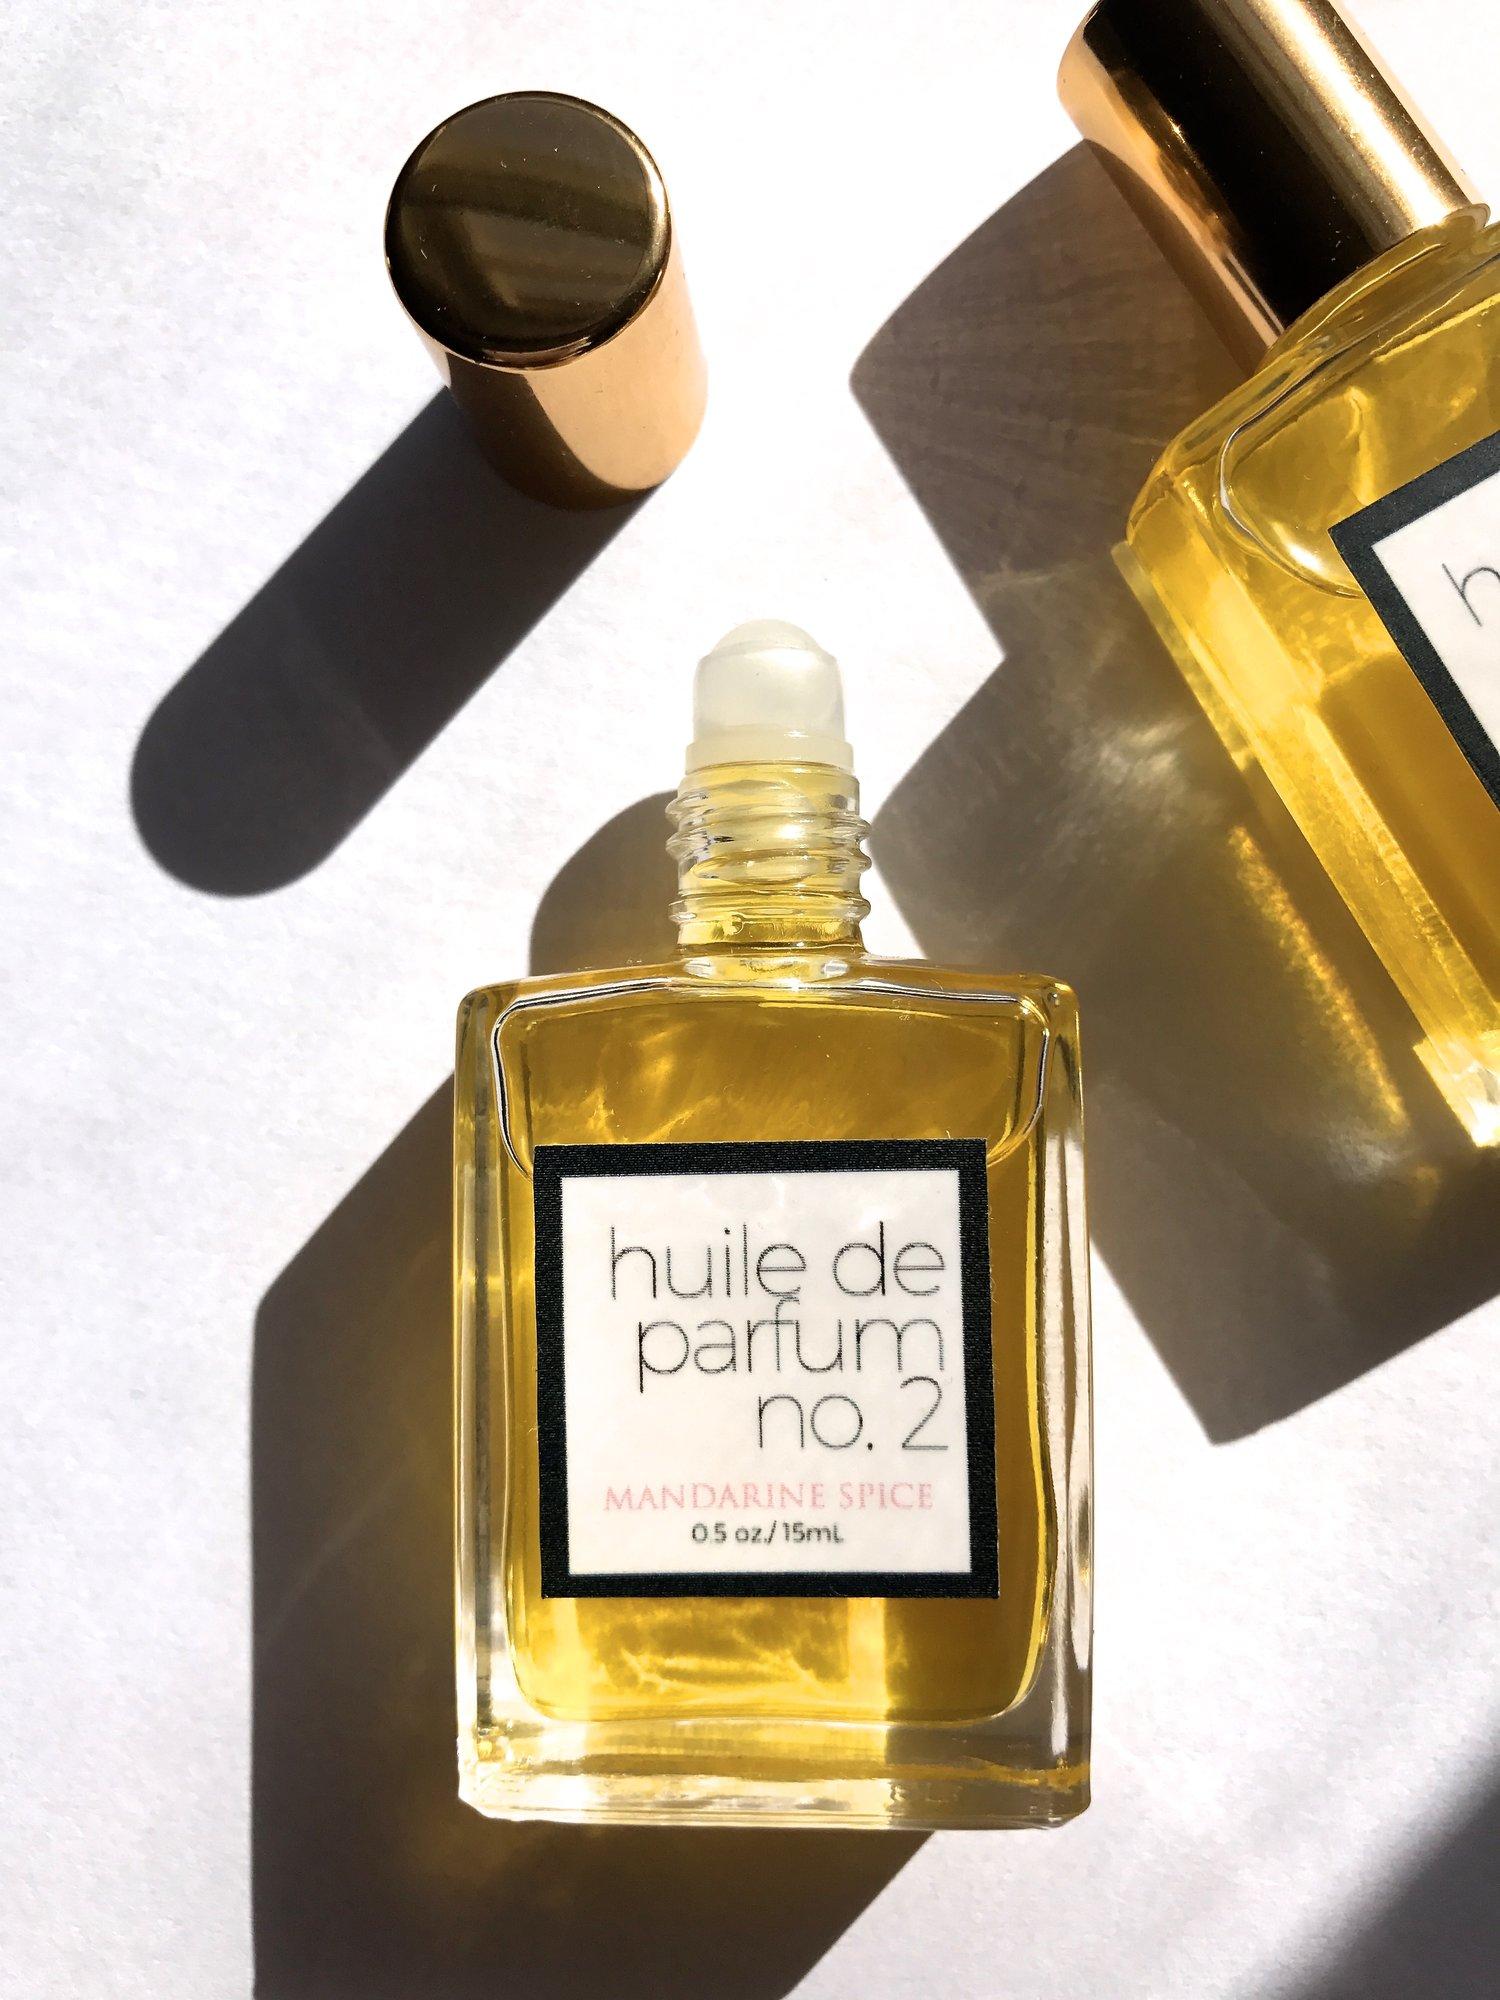 Signature Huile De Parfum Mandarine Spice Notablysmittenlimited